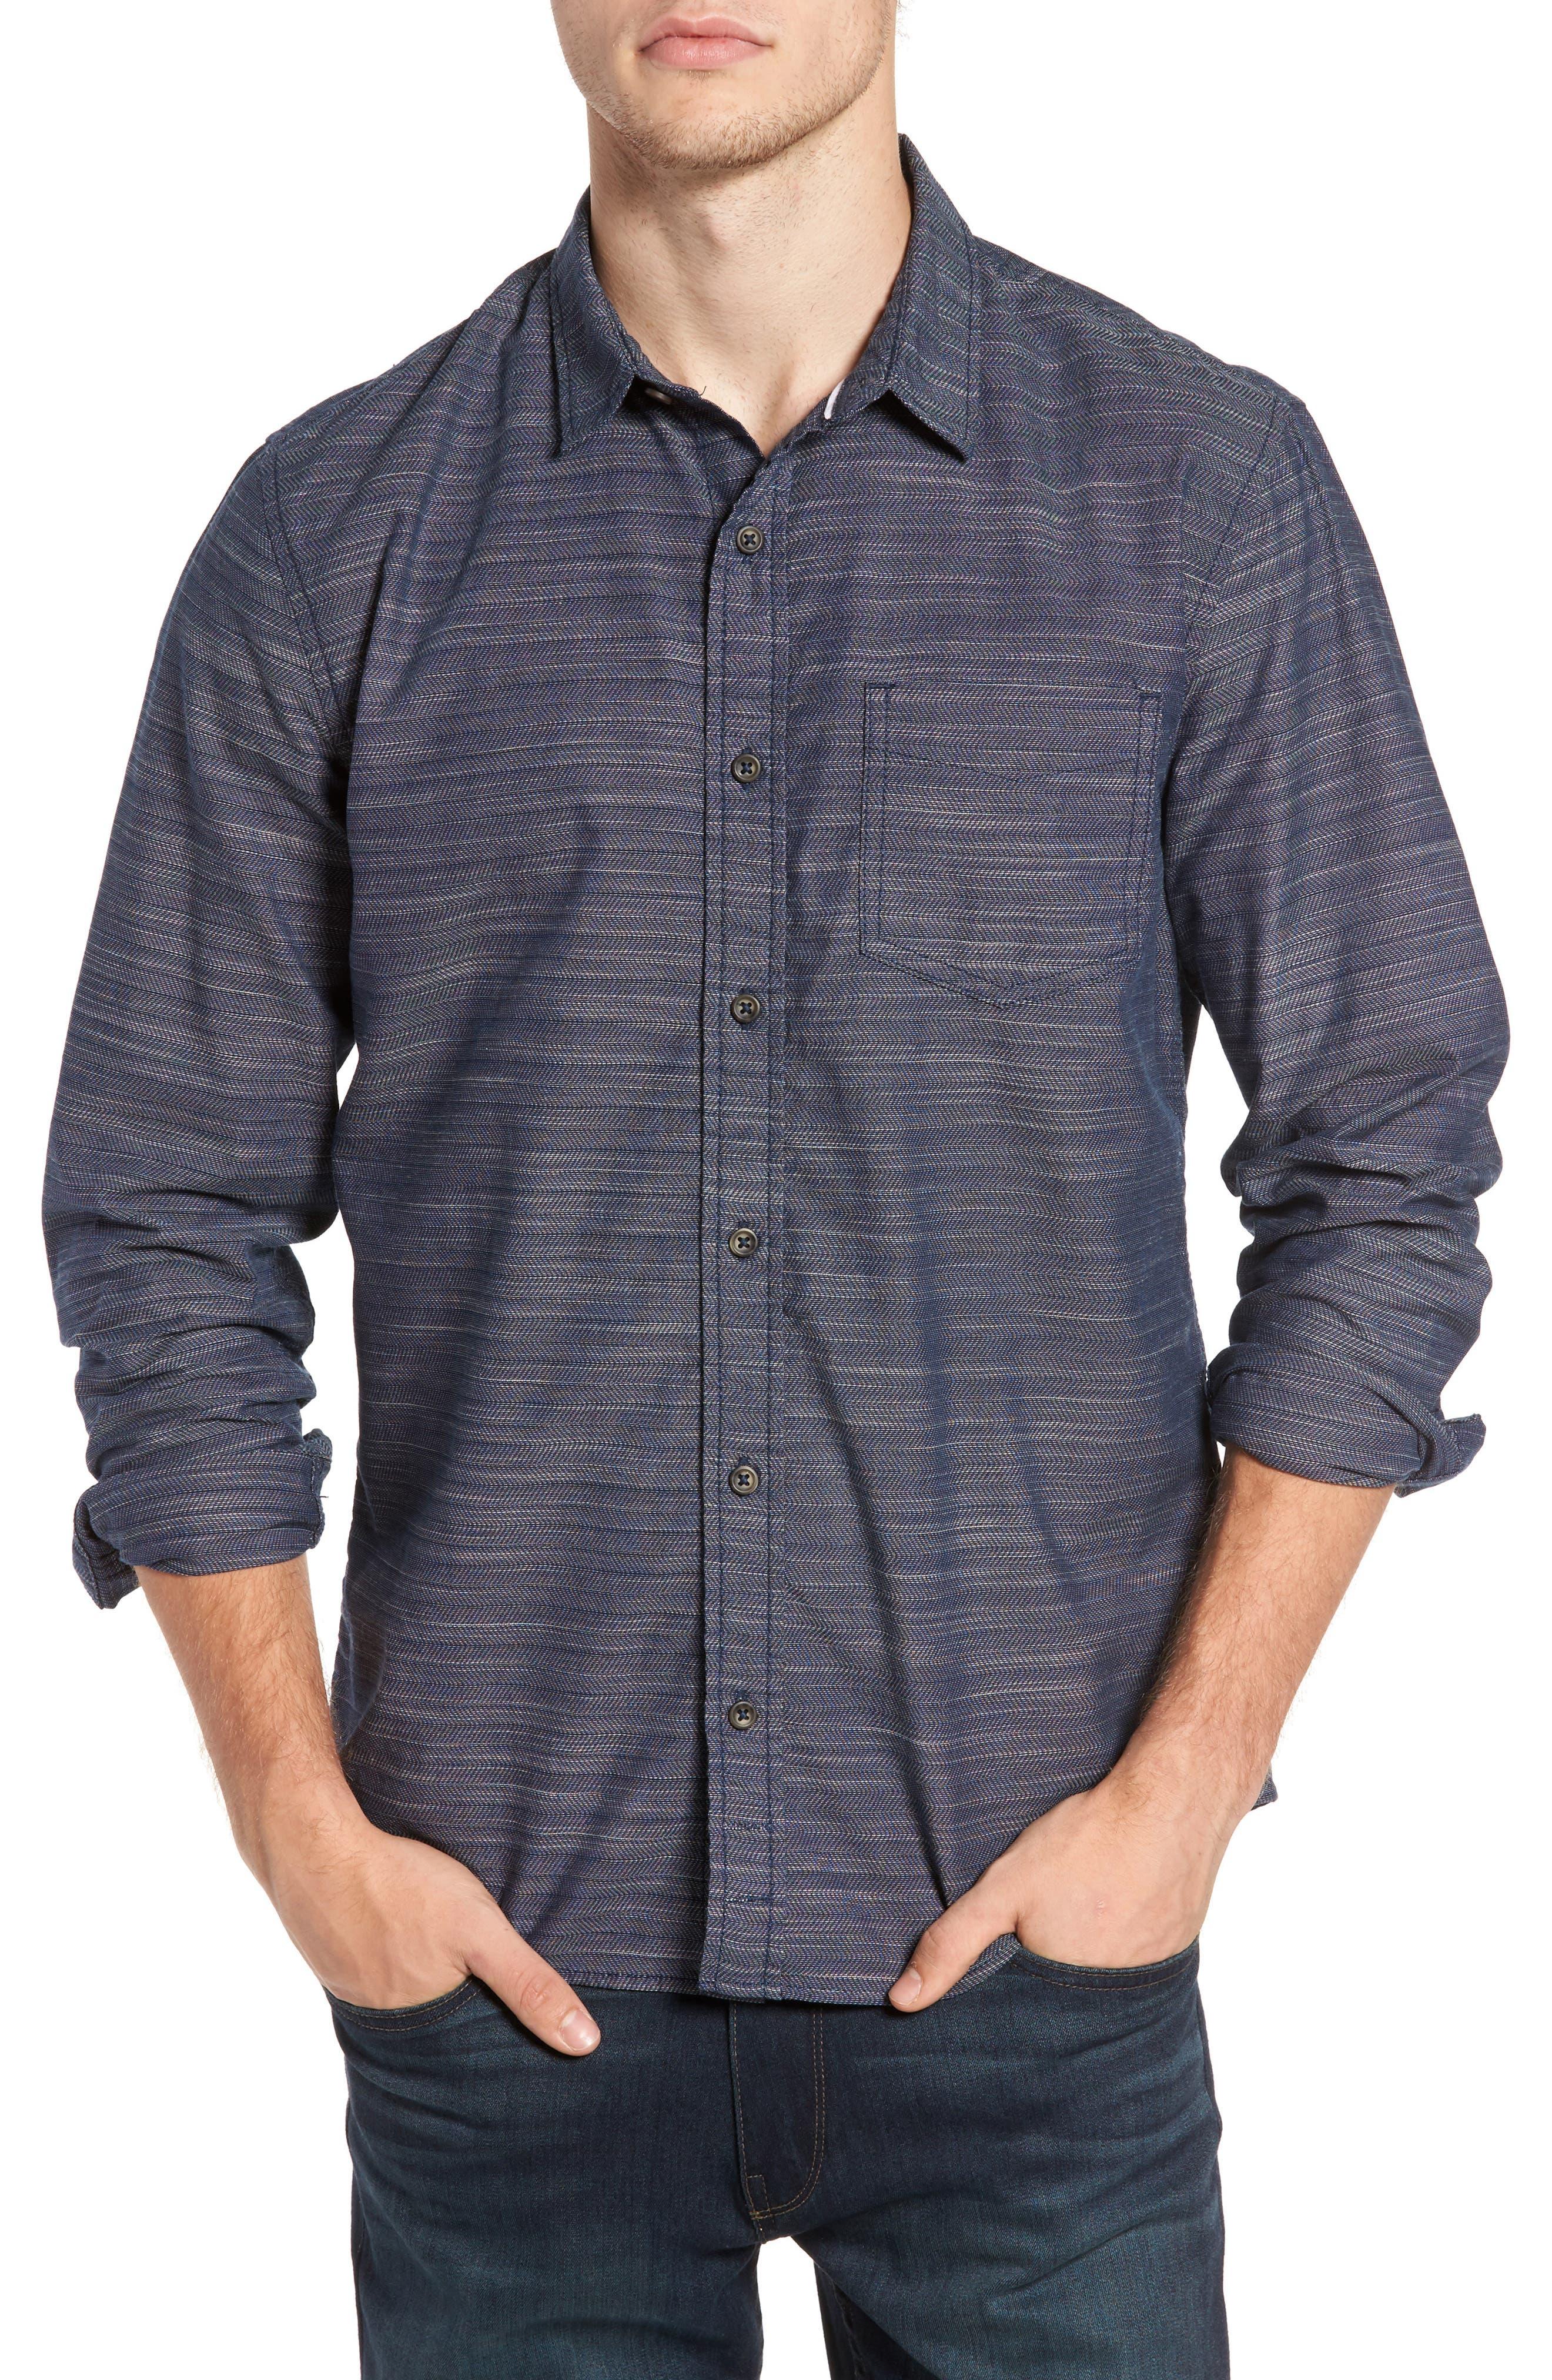 Herringbone Chambray Shirt,                         Main,                         color, Navy Charcoal Herringbone